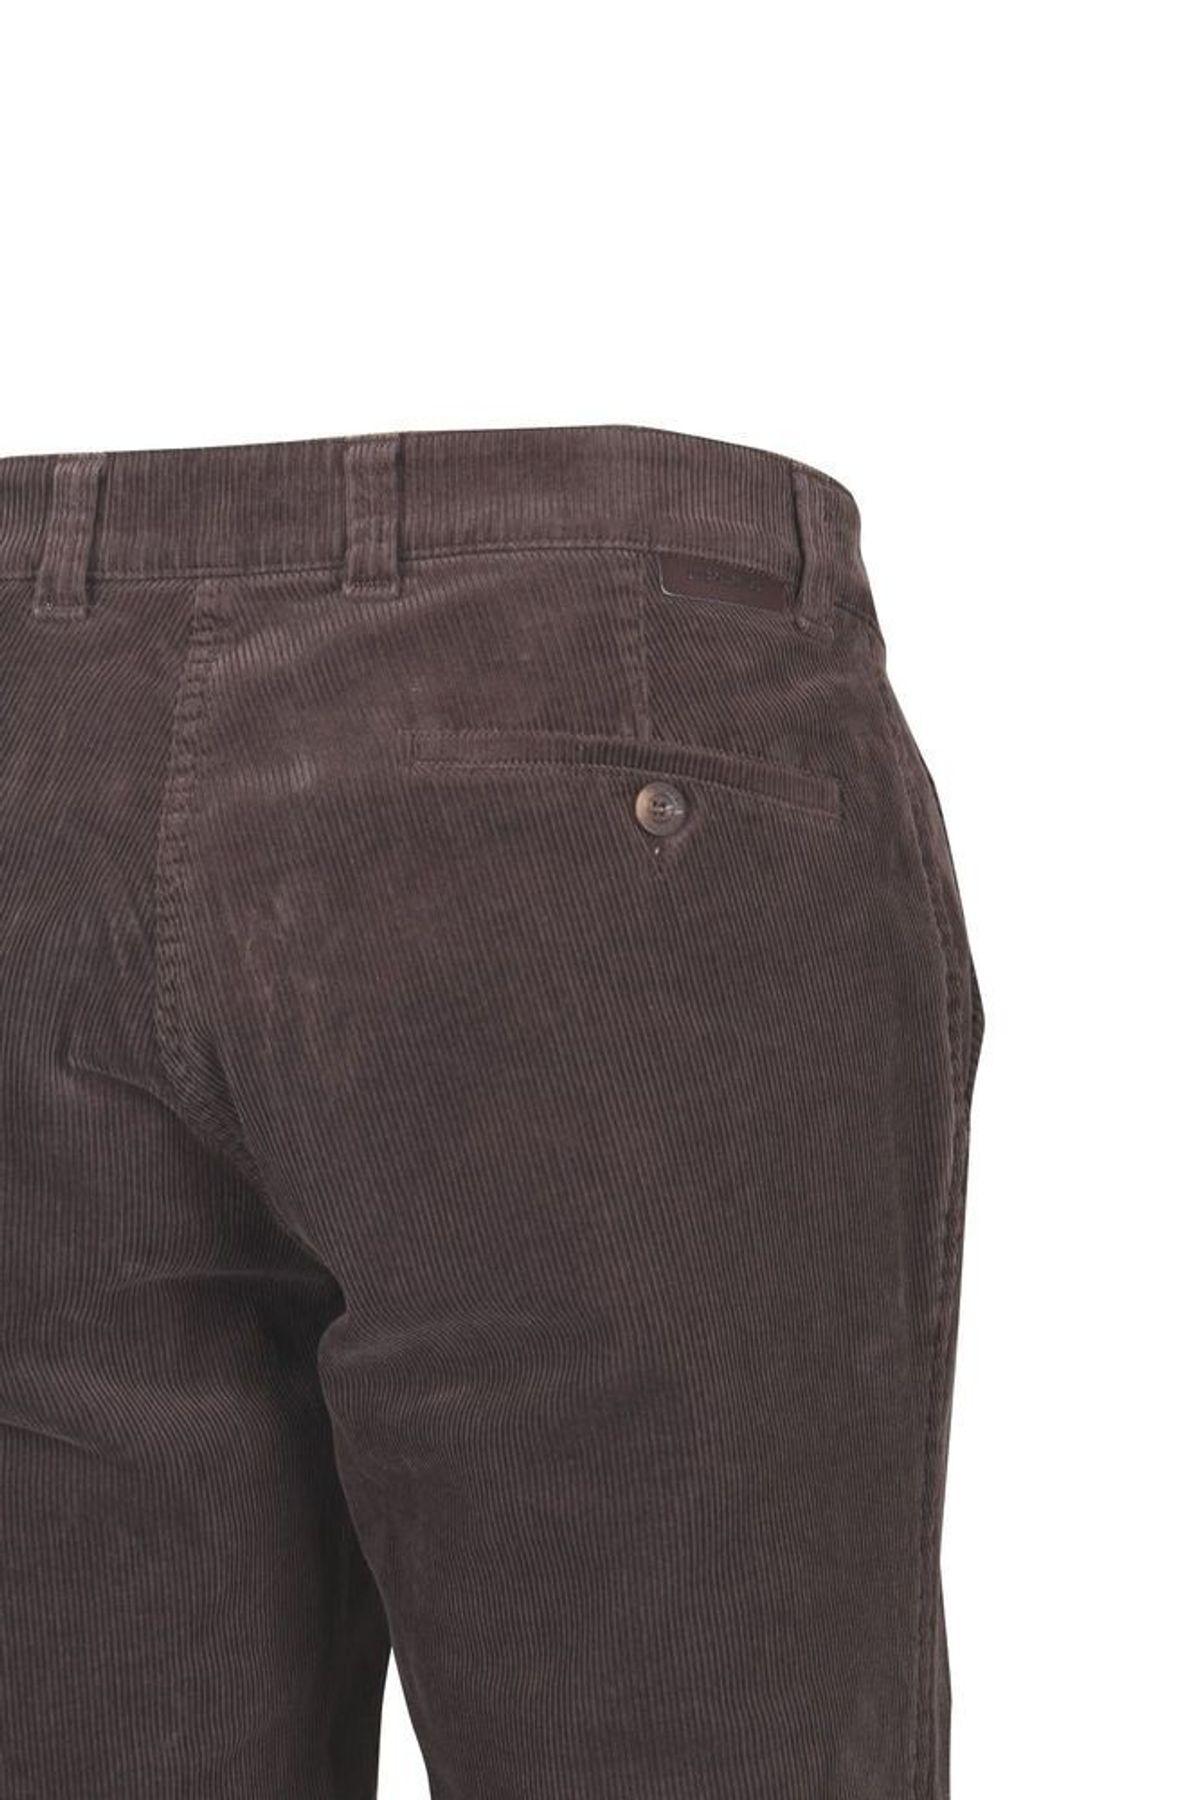 Club of Comfort - Herren Stretchcord Hose in verschiedenen Farben, Derry (5810) – Bild 21